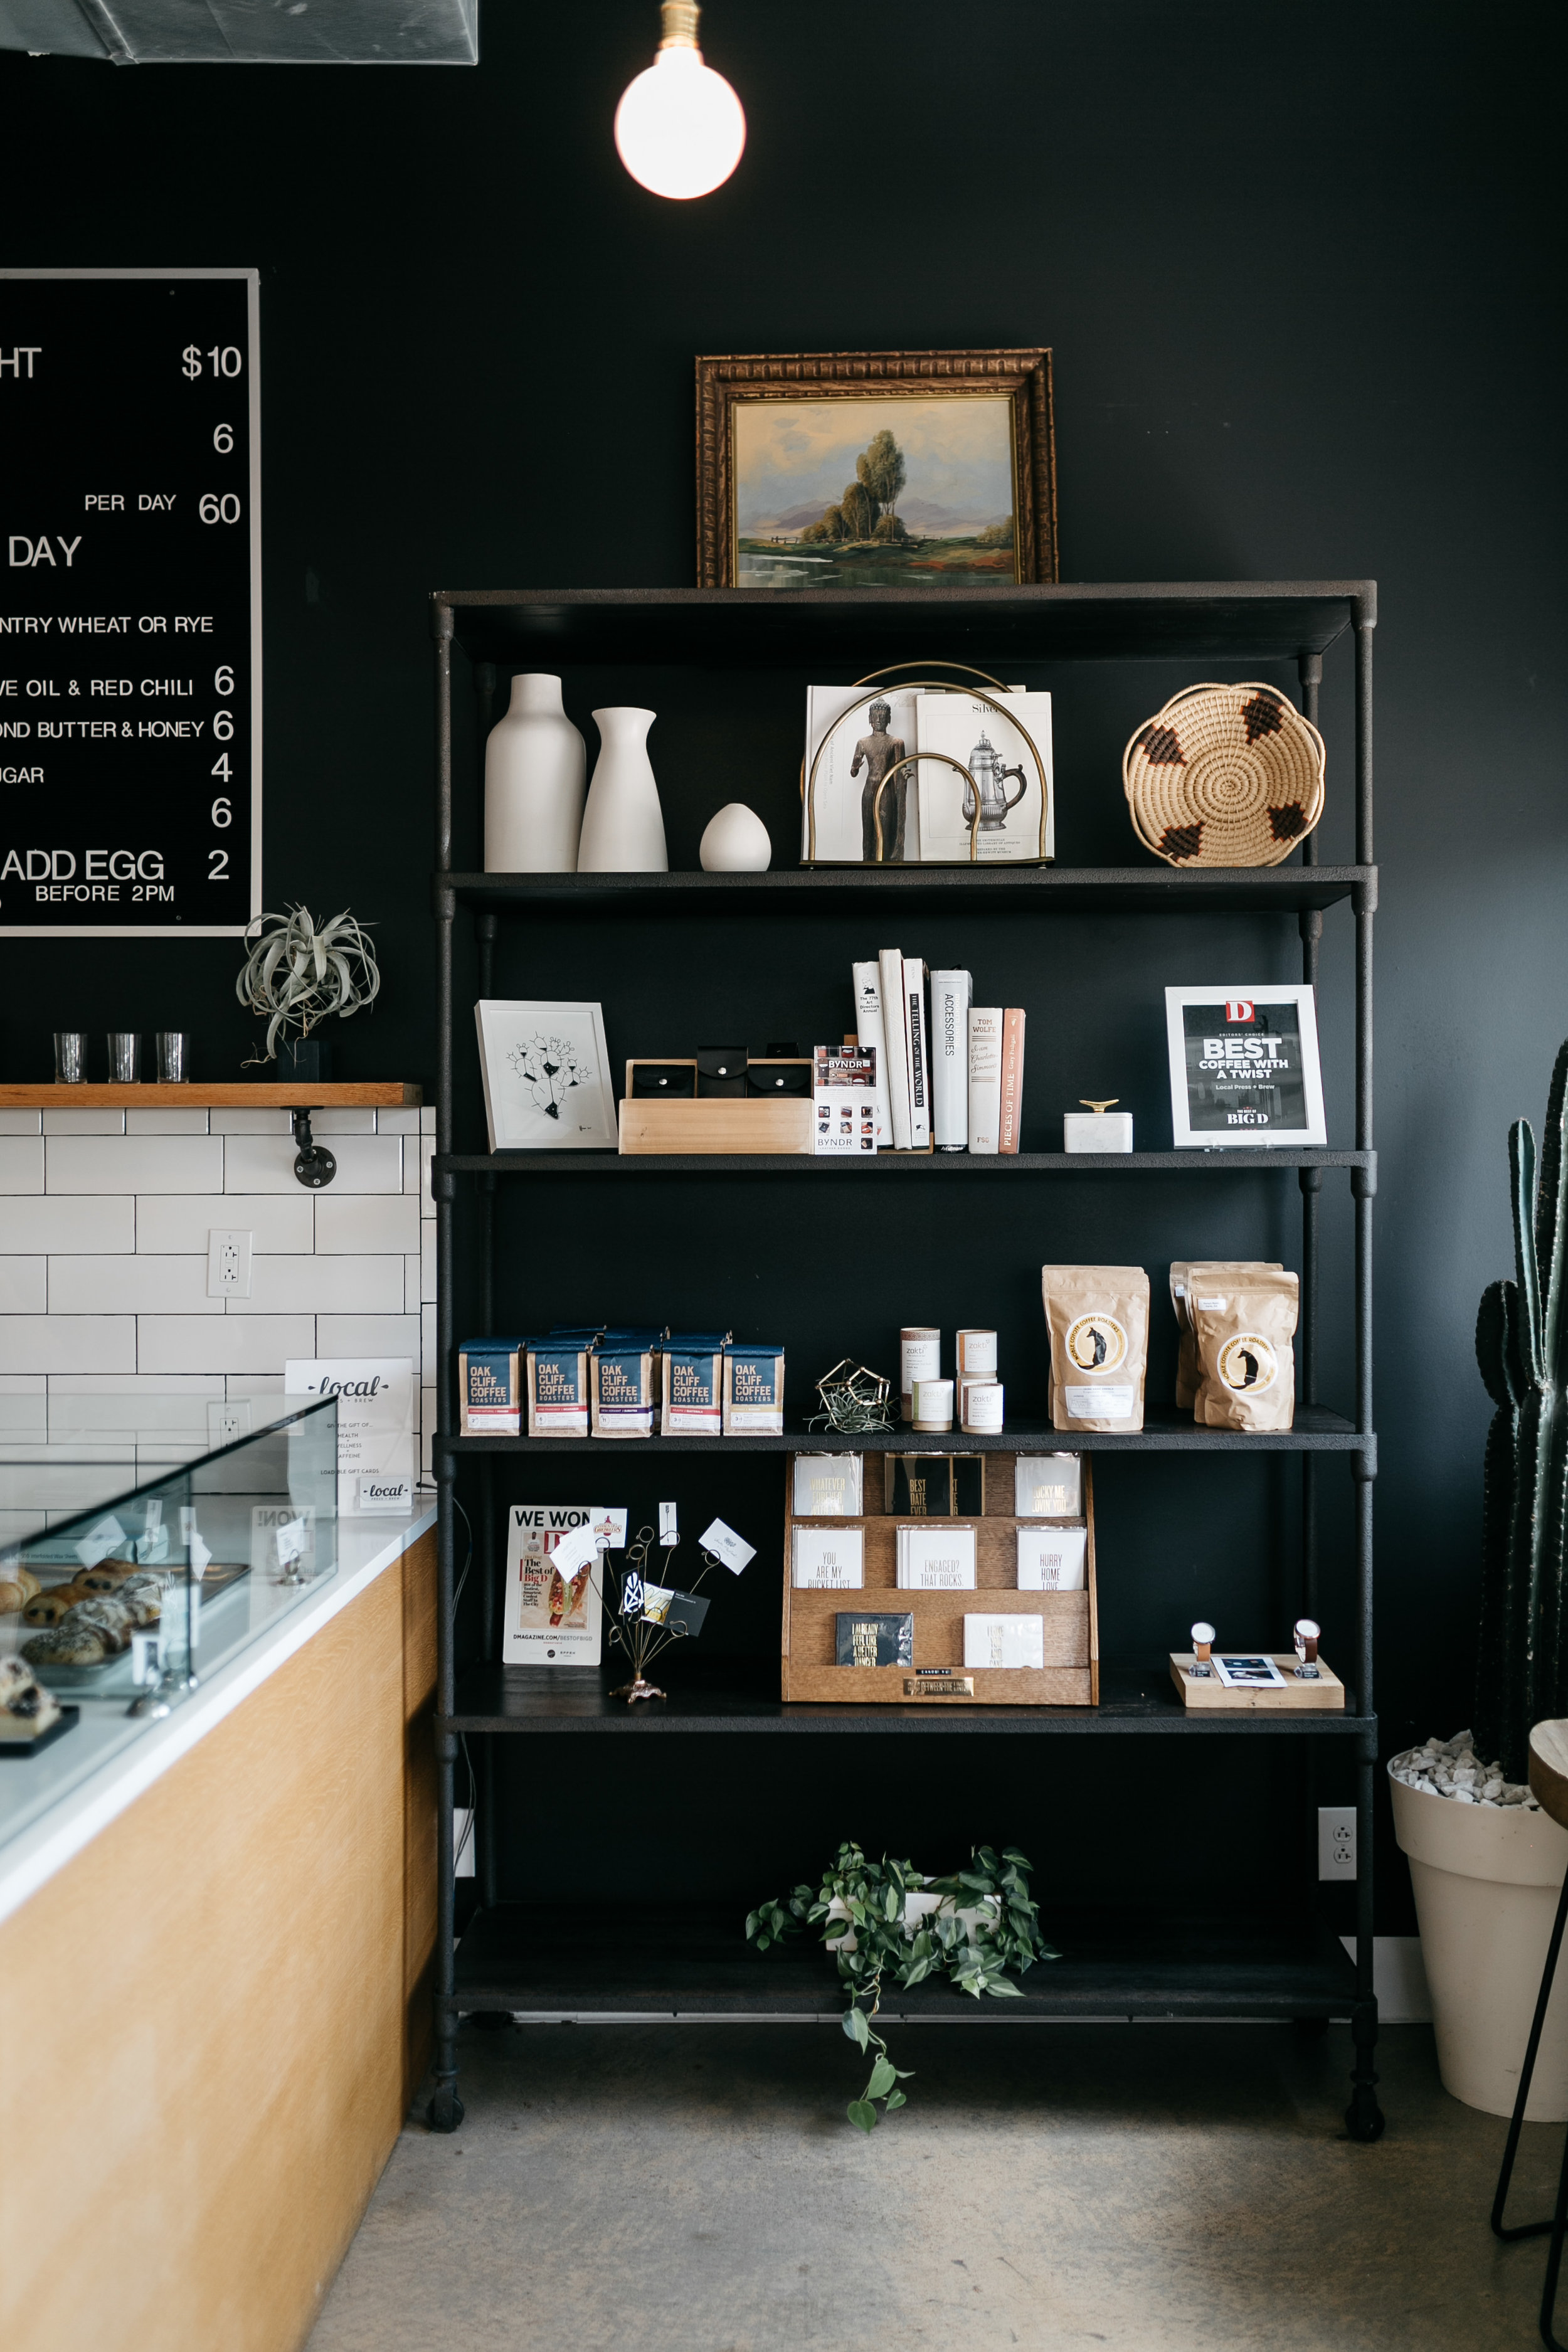 Local Press & Brew - Oak Cliff